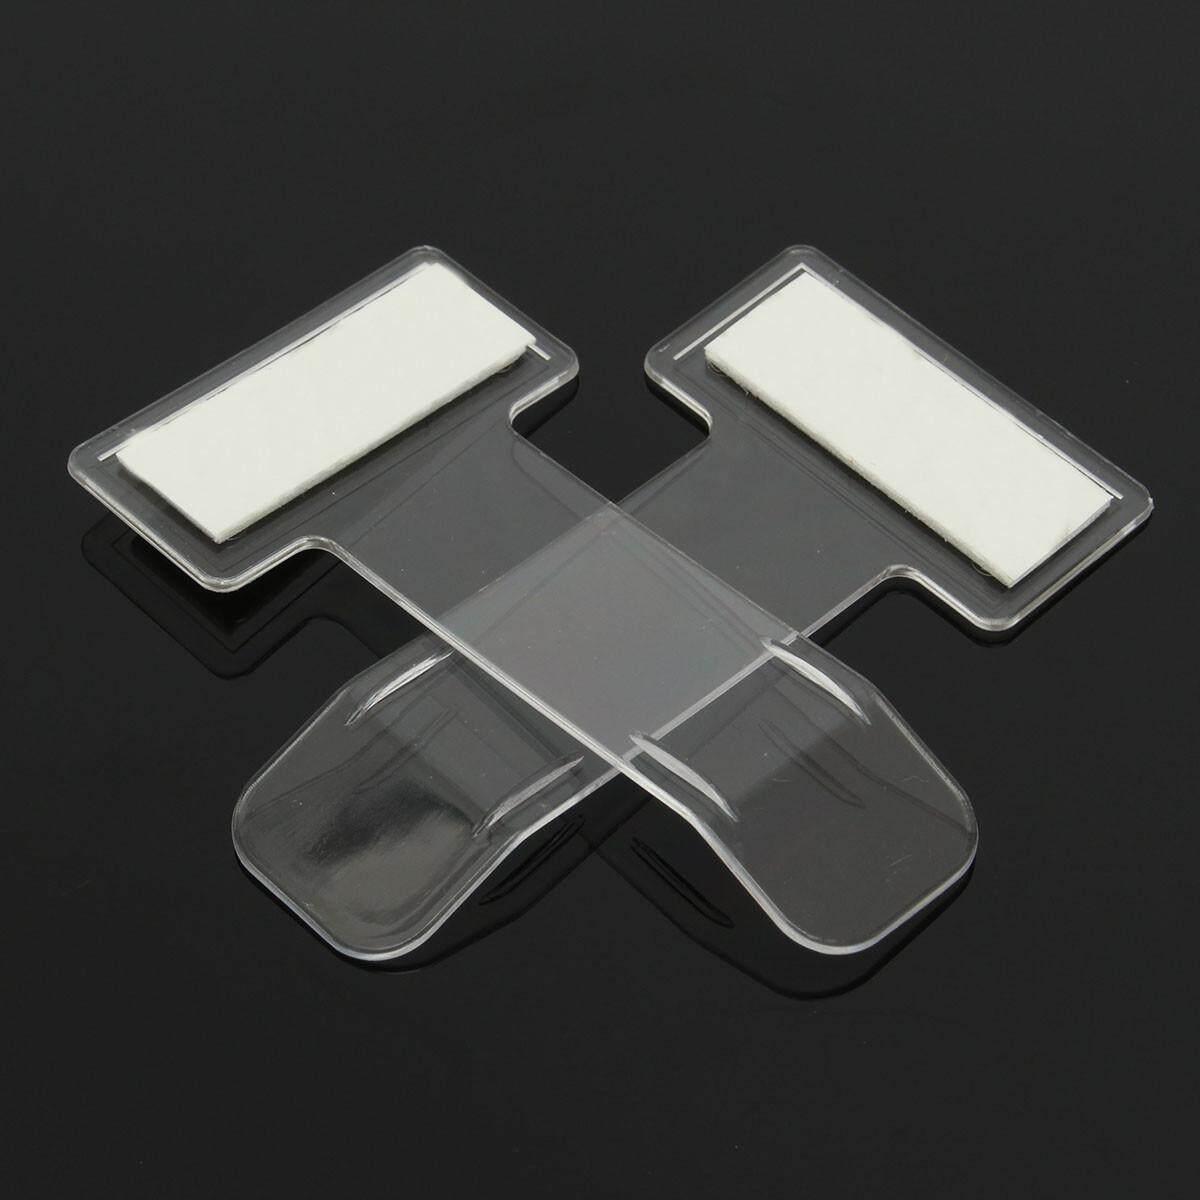 2pcs Car Vehicle Parking Ticket Permit Holder Clip Sticker Windscreen Window USA - intl